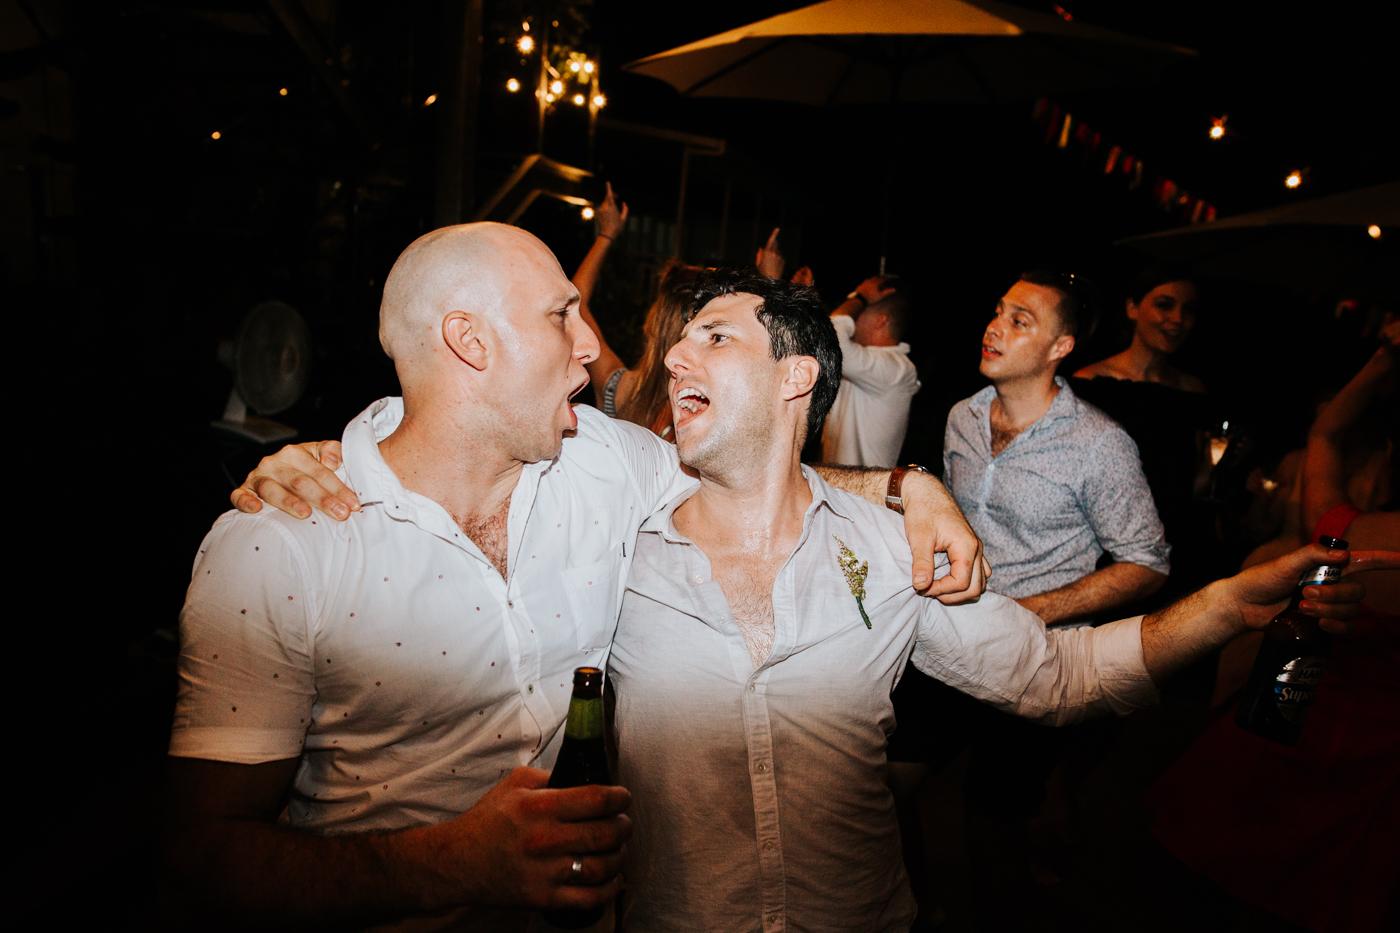 Emma & Ben - Lake Macquarie - Hunter Valley Wedding - Samantha Heather Photography-250.jpg